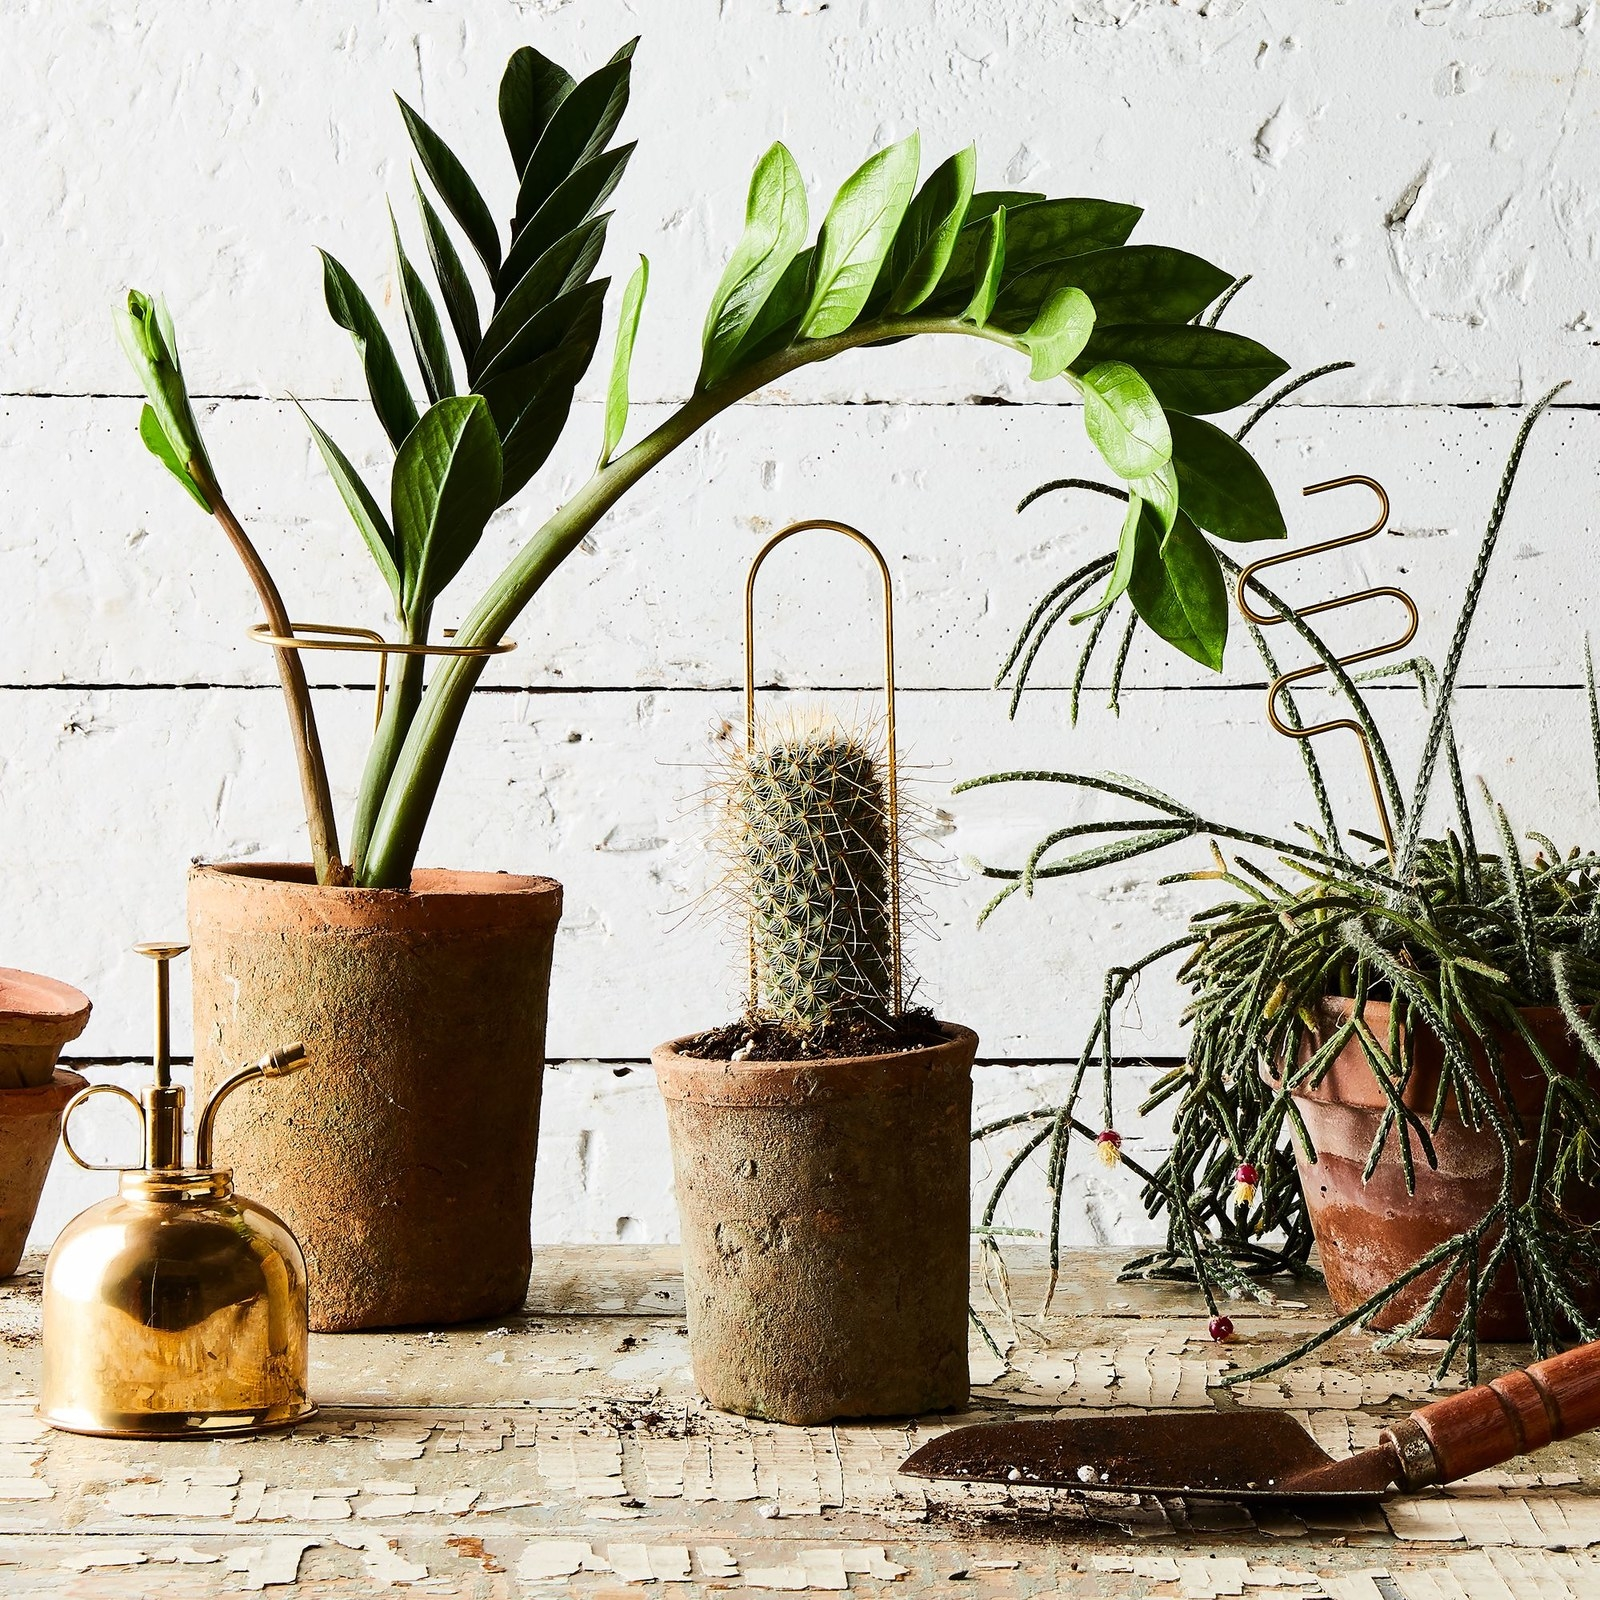 Geometric brass plant sticks in pots